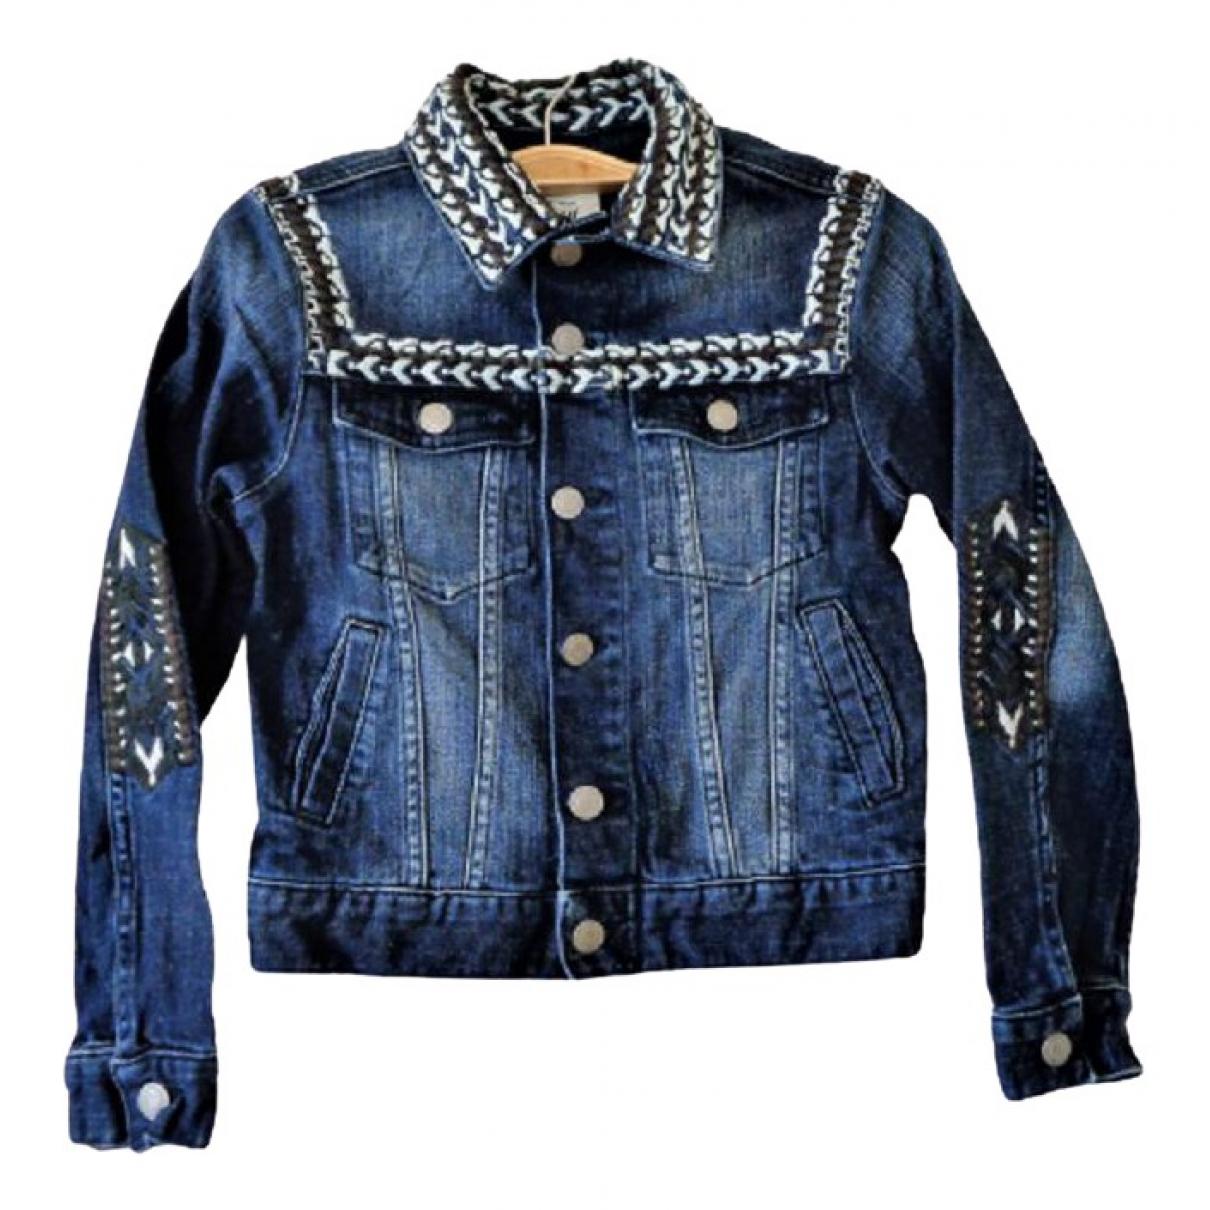 Isabel Marant Pour H&m \N Jacke, Maentel in  Blau Denim - Jeans